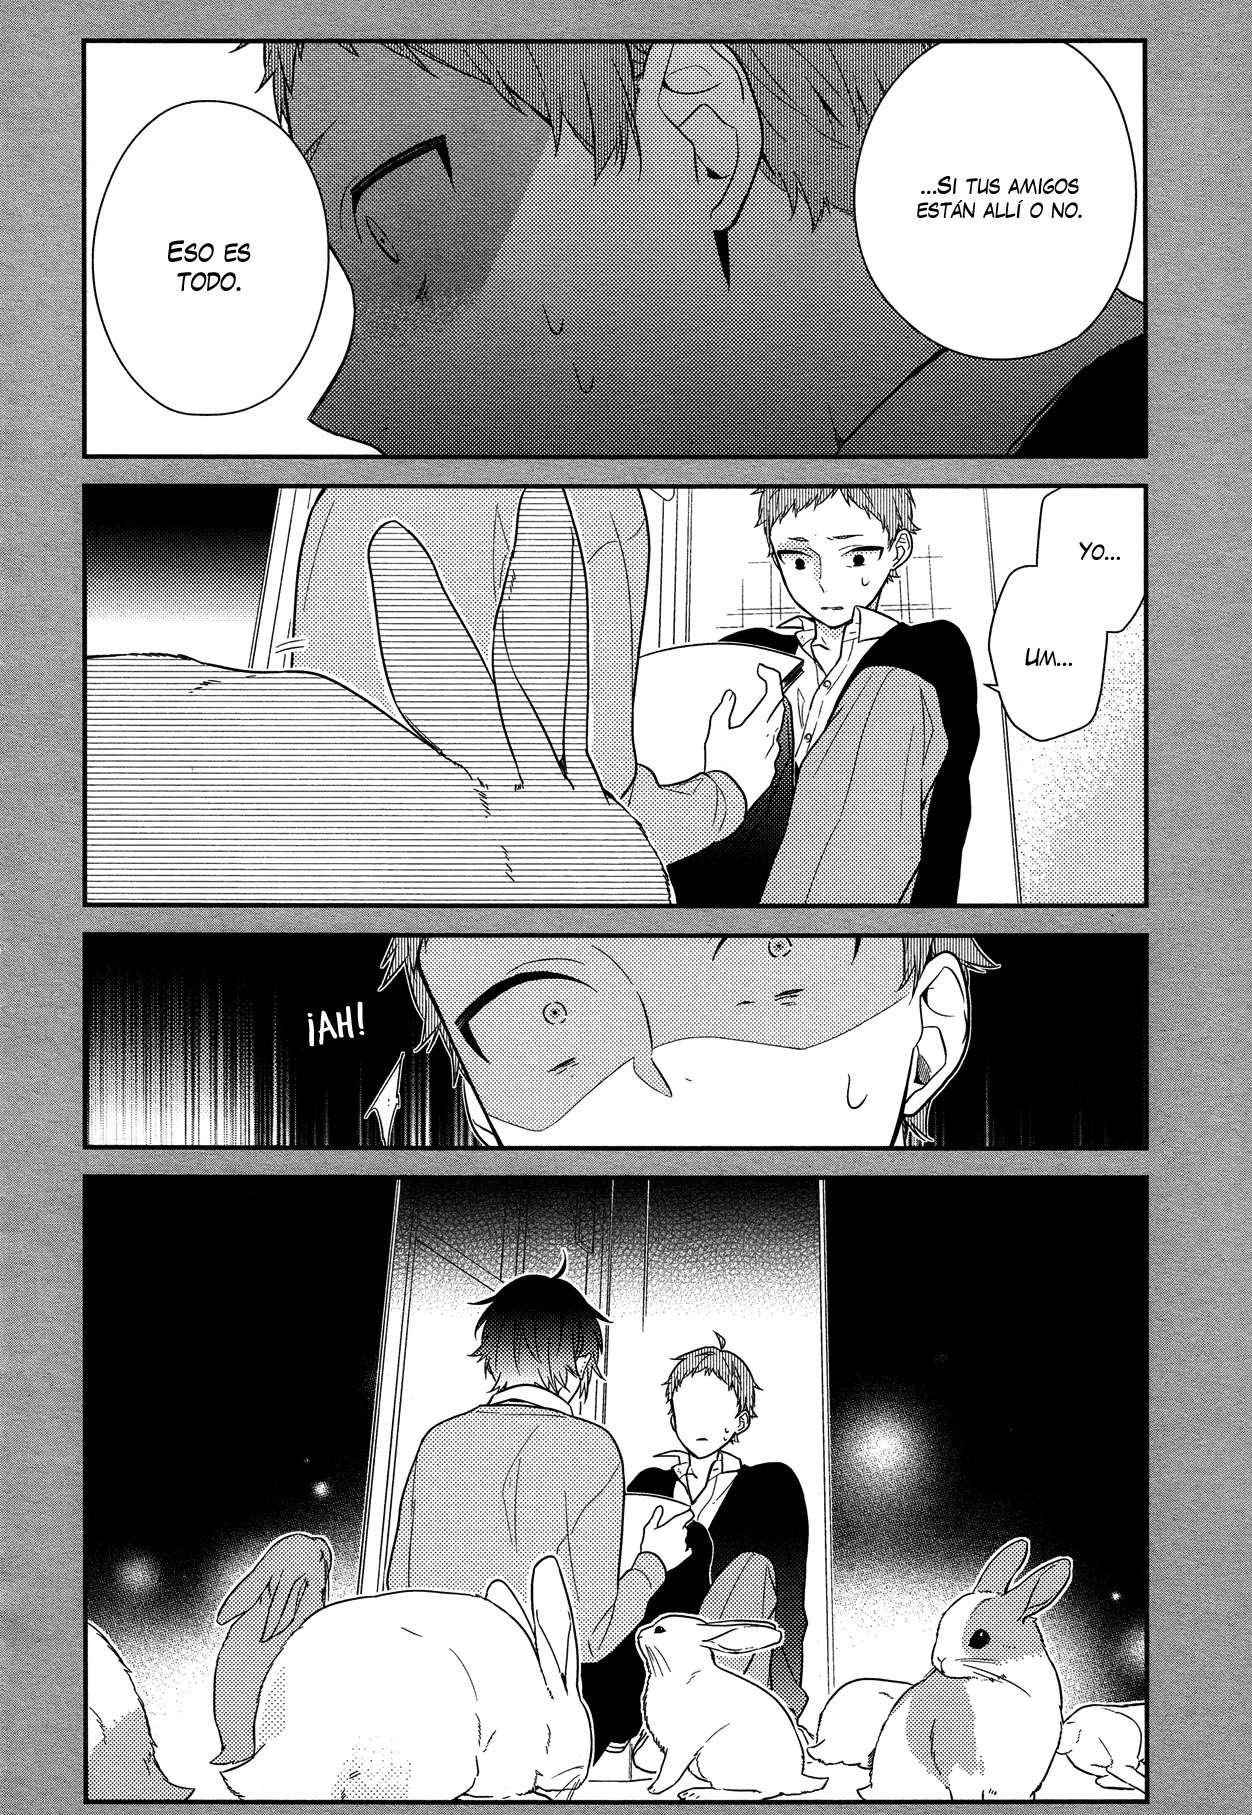 http://c5.ninemanga.com/es_manga/19/1043/417194/073c83fb6a5532256c1f33f207330684.jpg Page 11